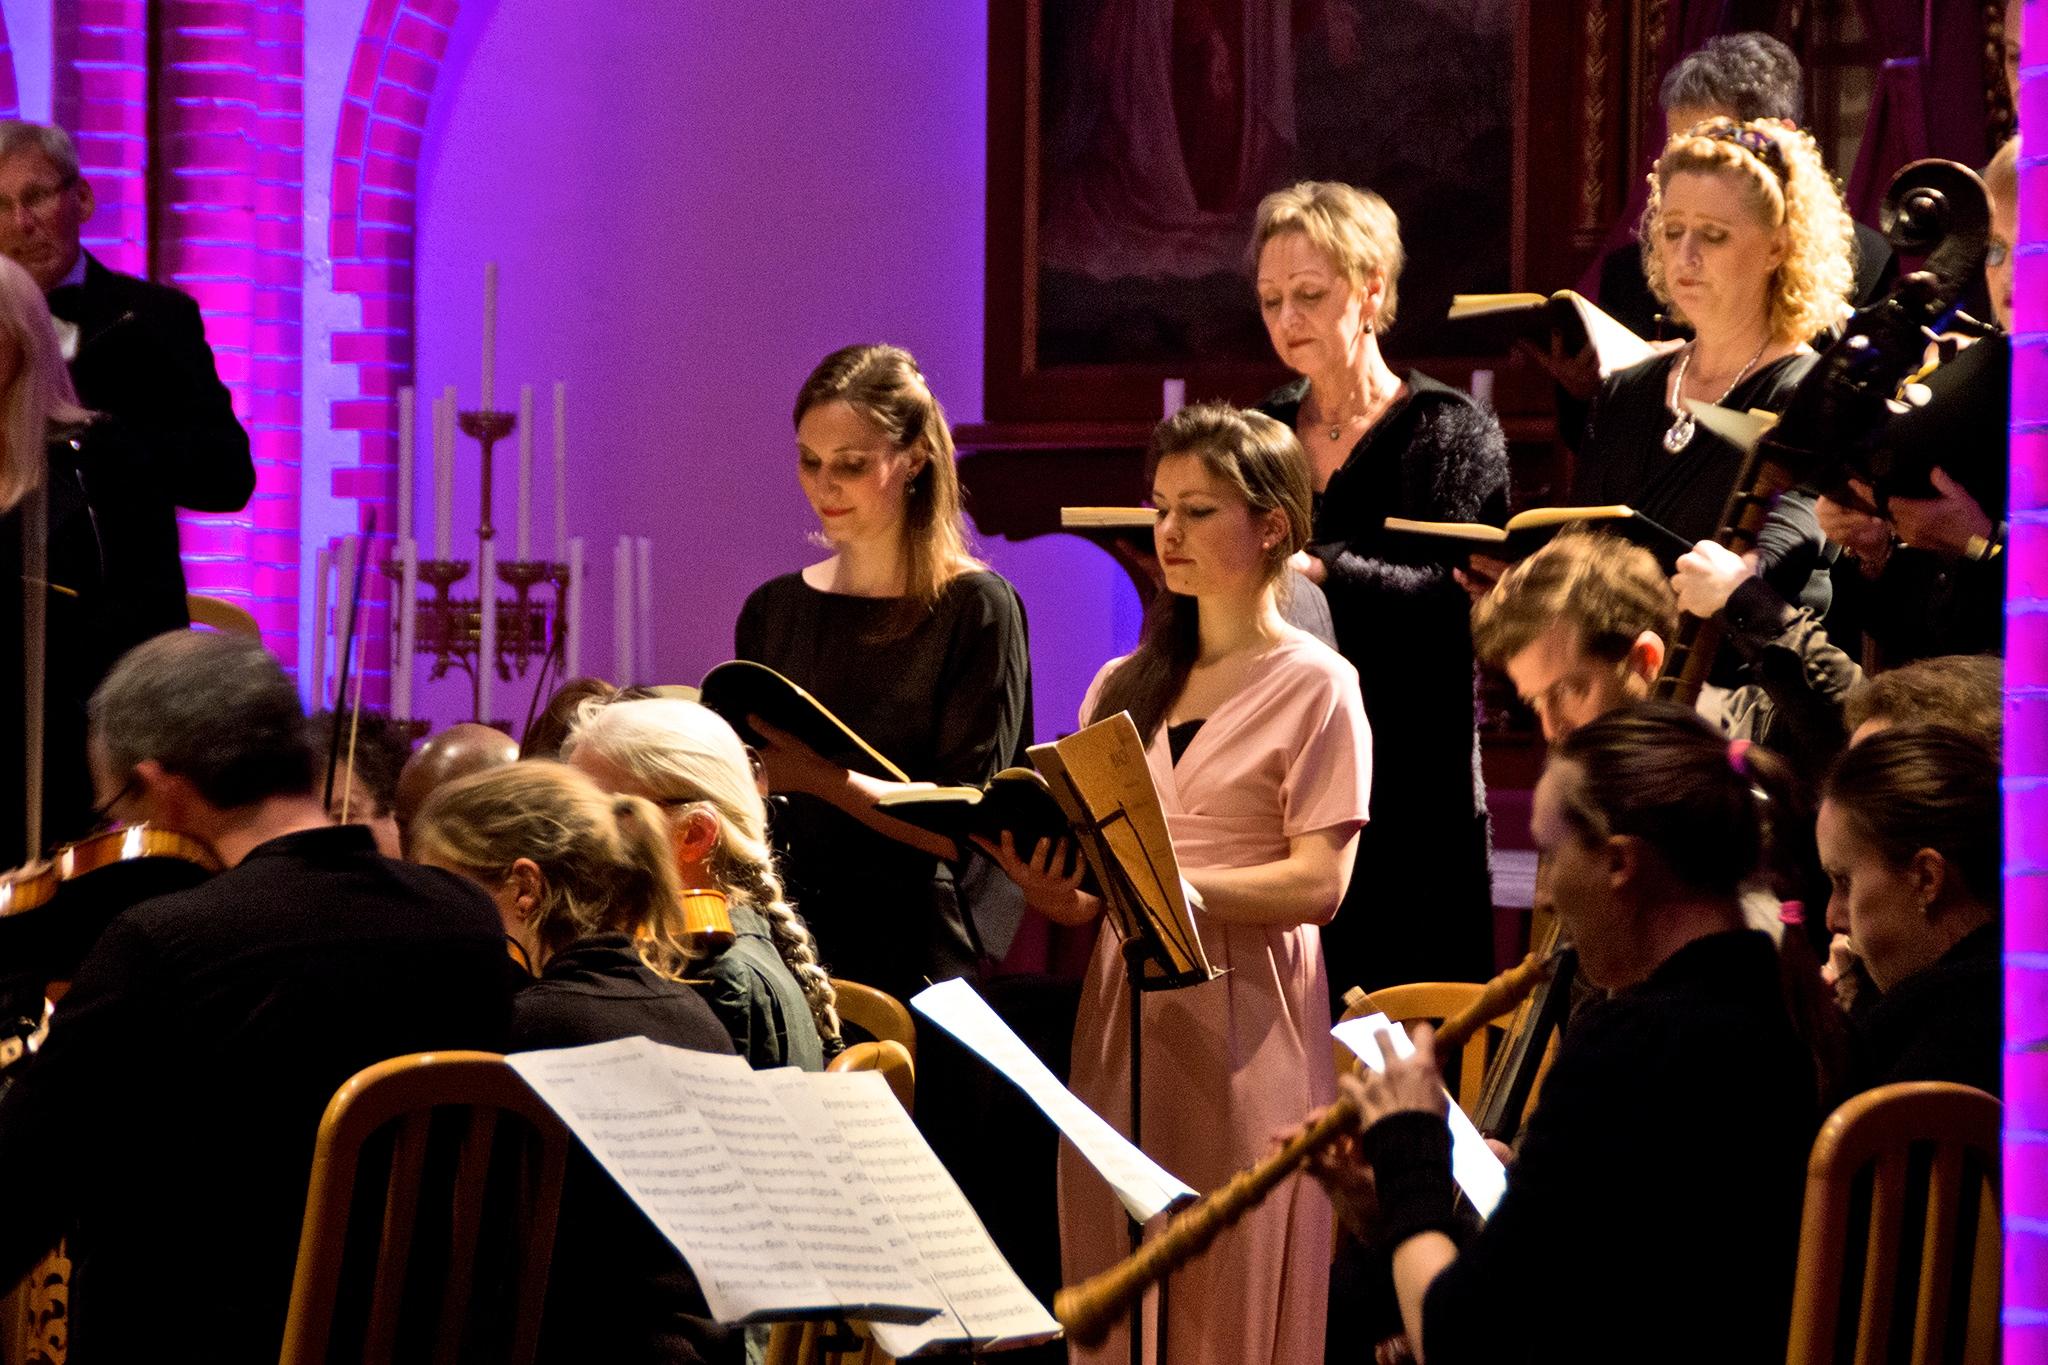 Mathew Passion @ Tegelen, Charlotte Houberg - Soprano, Rosina Fabius - Alto